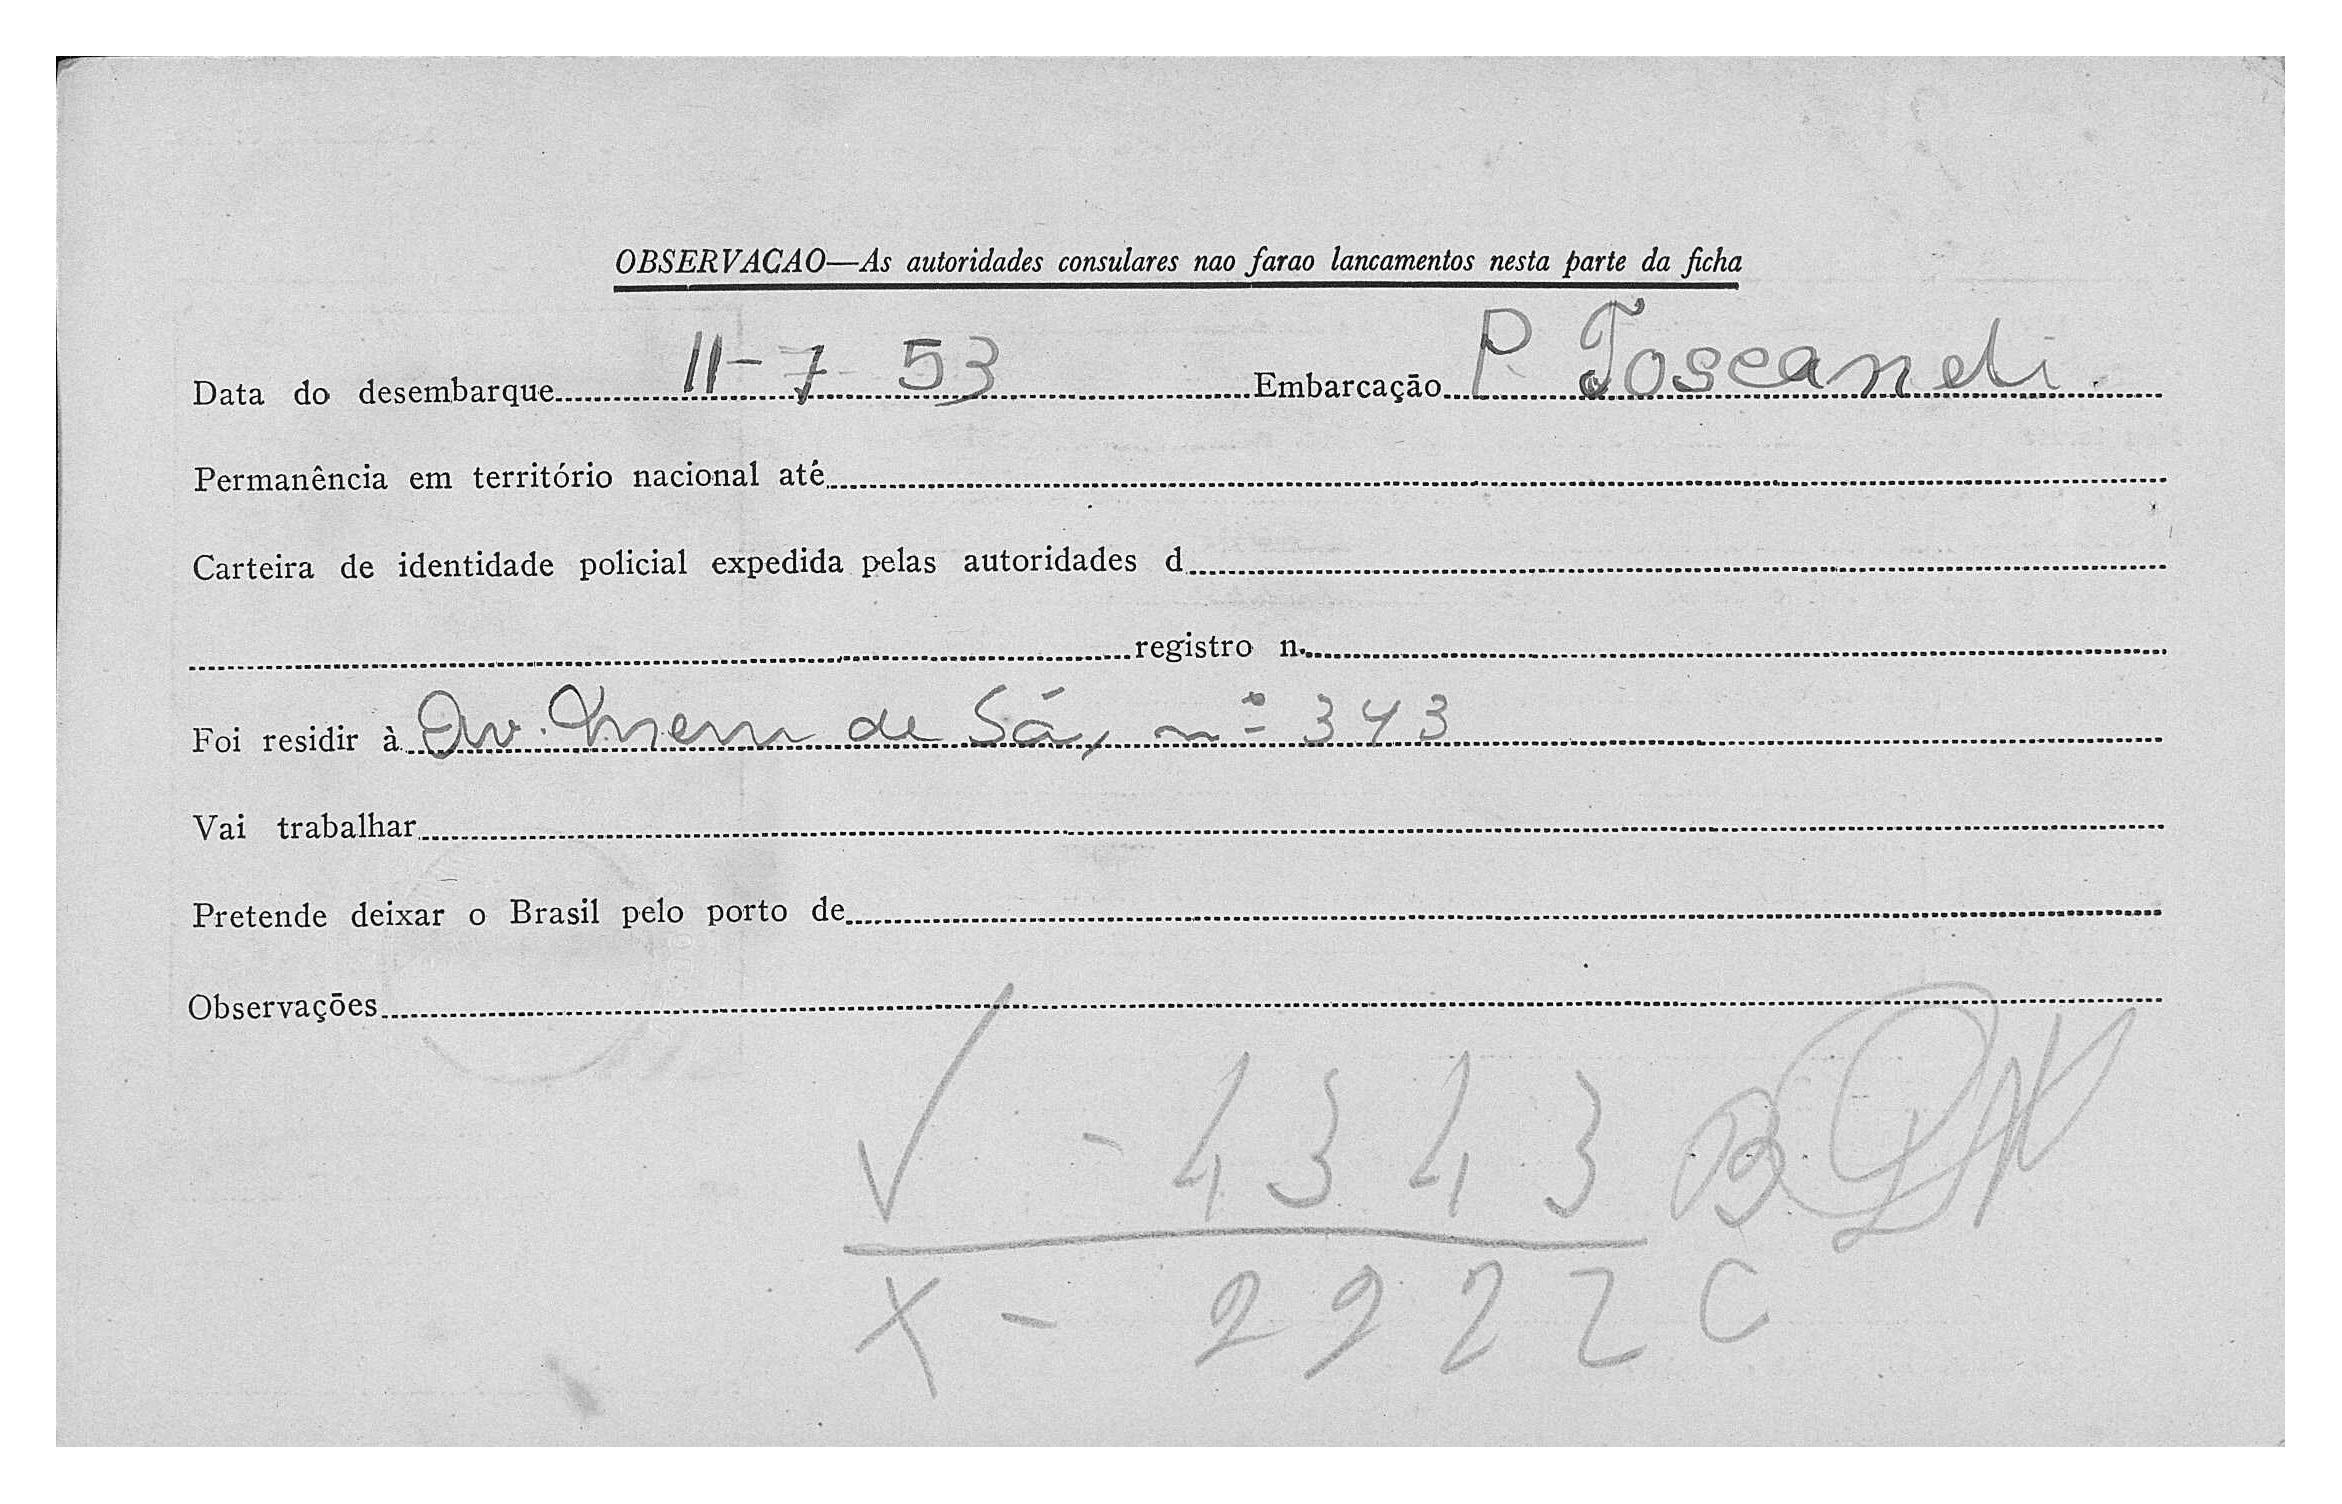 Nicholas-1953-05-ficha-consular-RJ-04-copy1.jpg